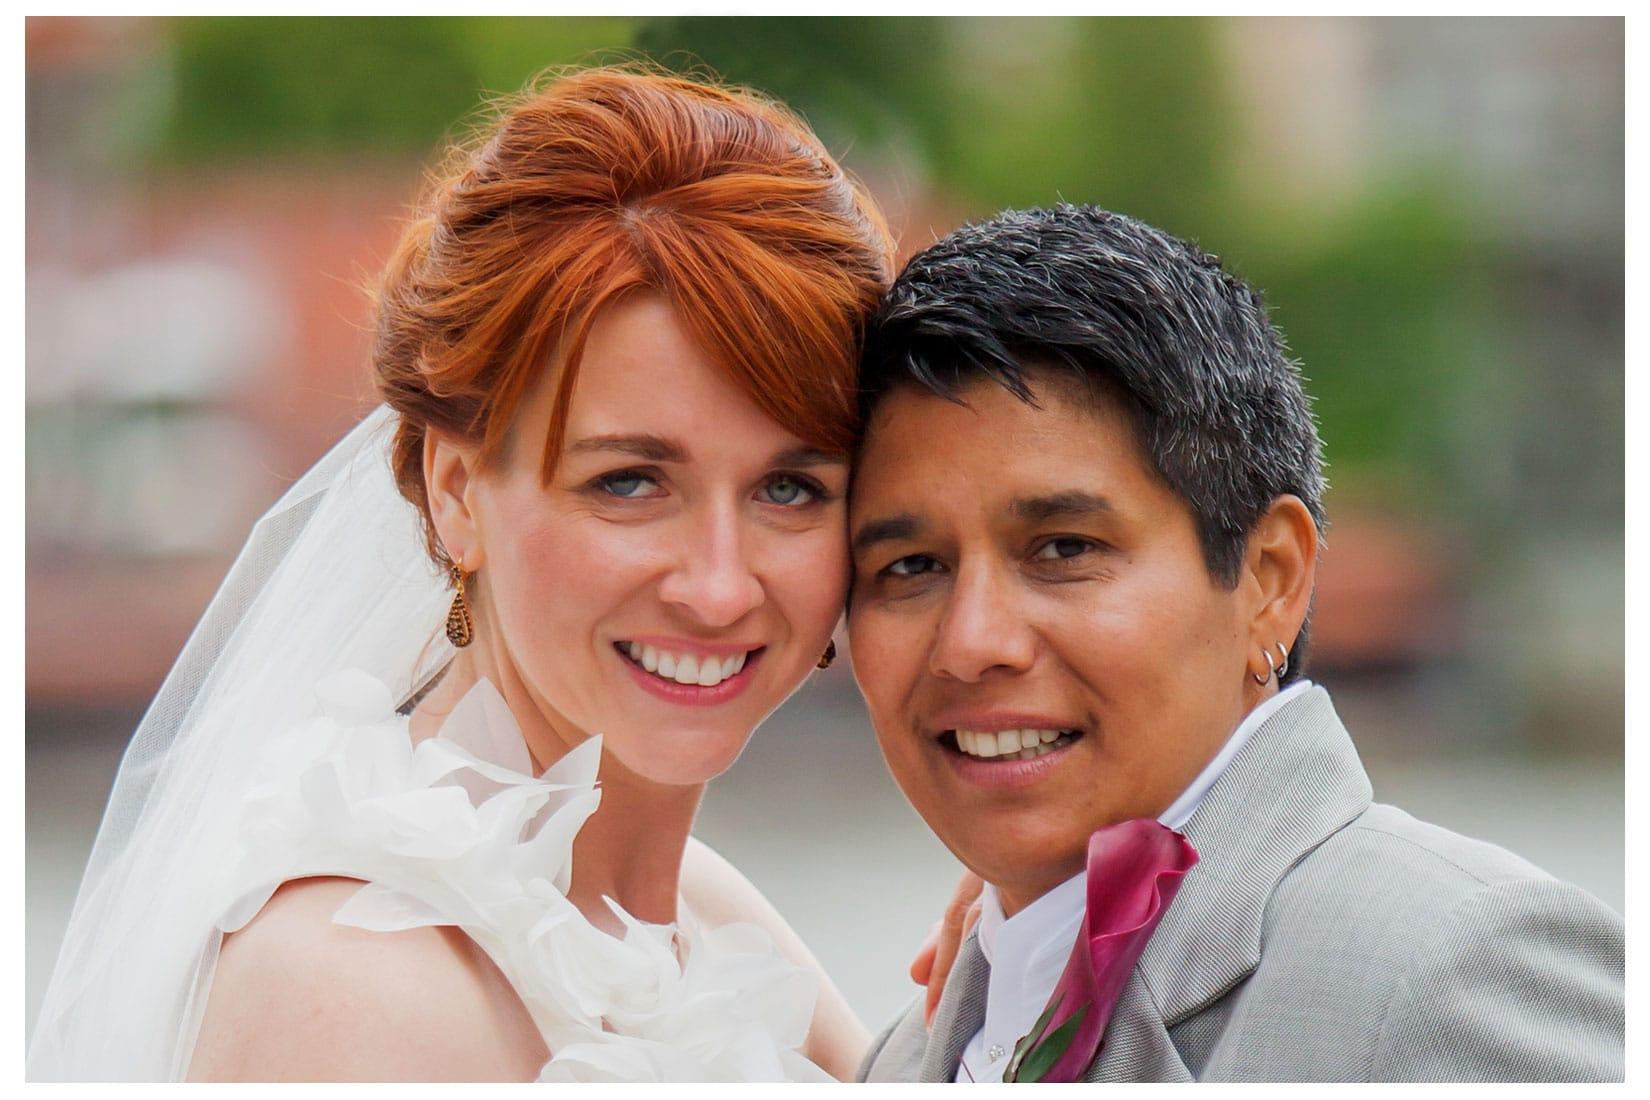 Charles Bridge Wedding / Kimberly & Jules / Charles Bridge wedding portraits